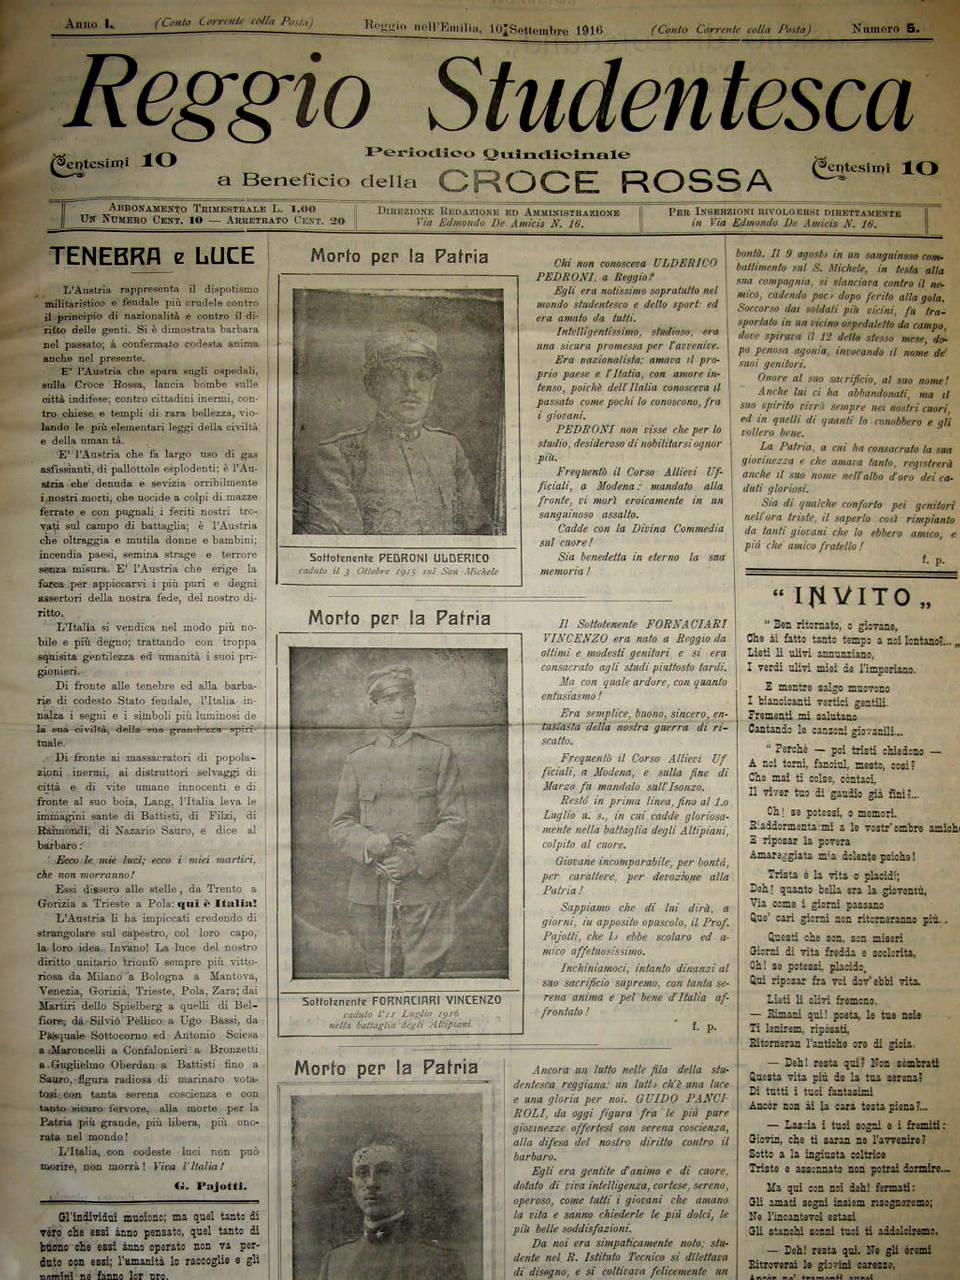 reggio studentesca, emeroteca biblioteca panizzi - reggio emilia 1916